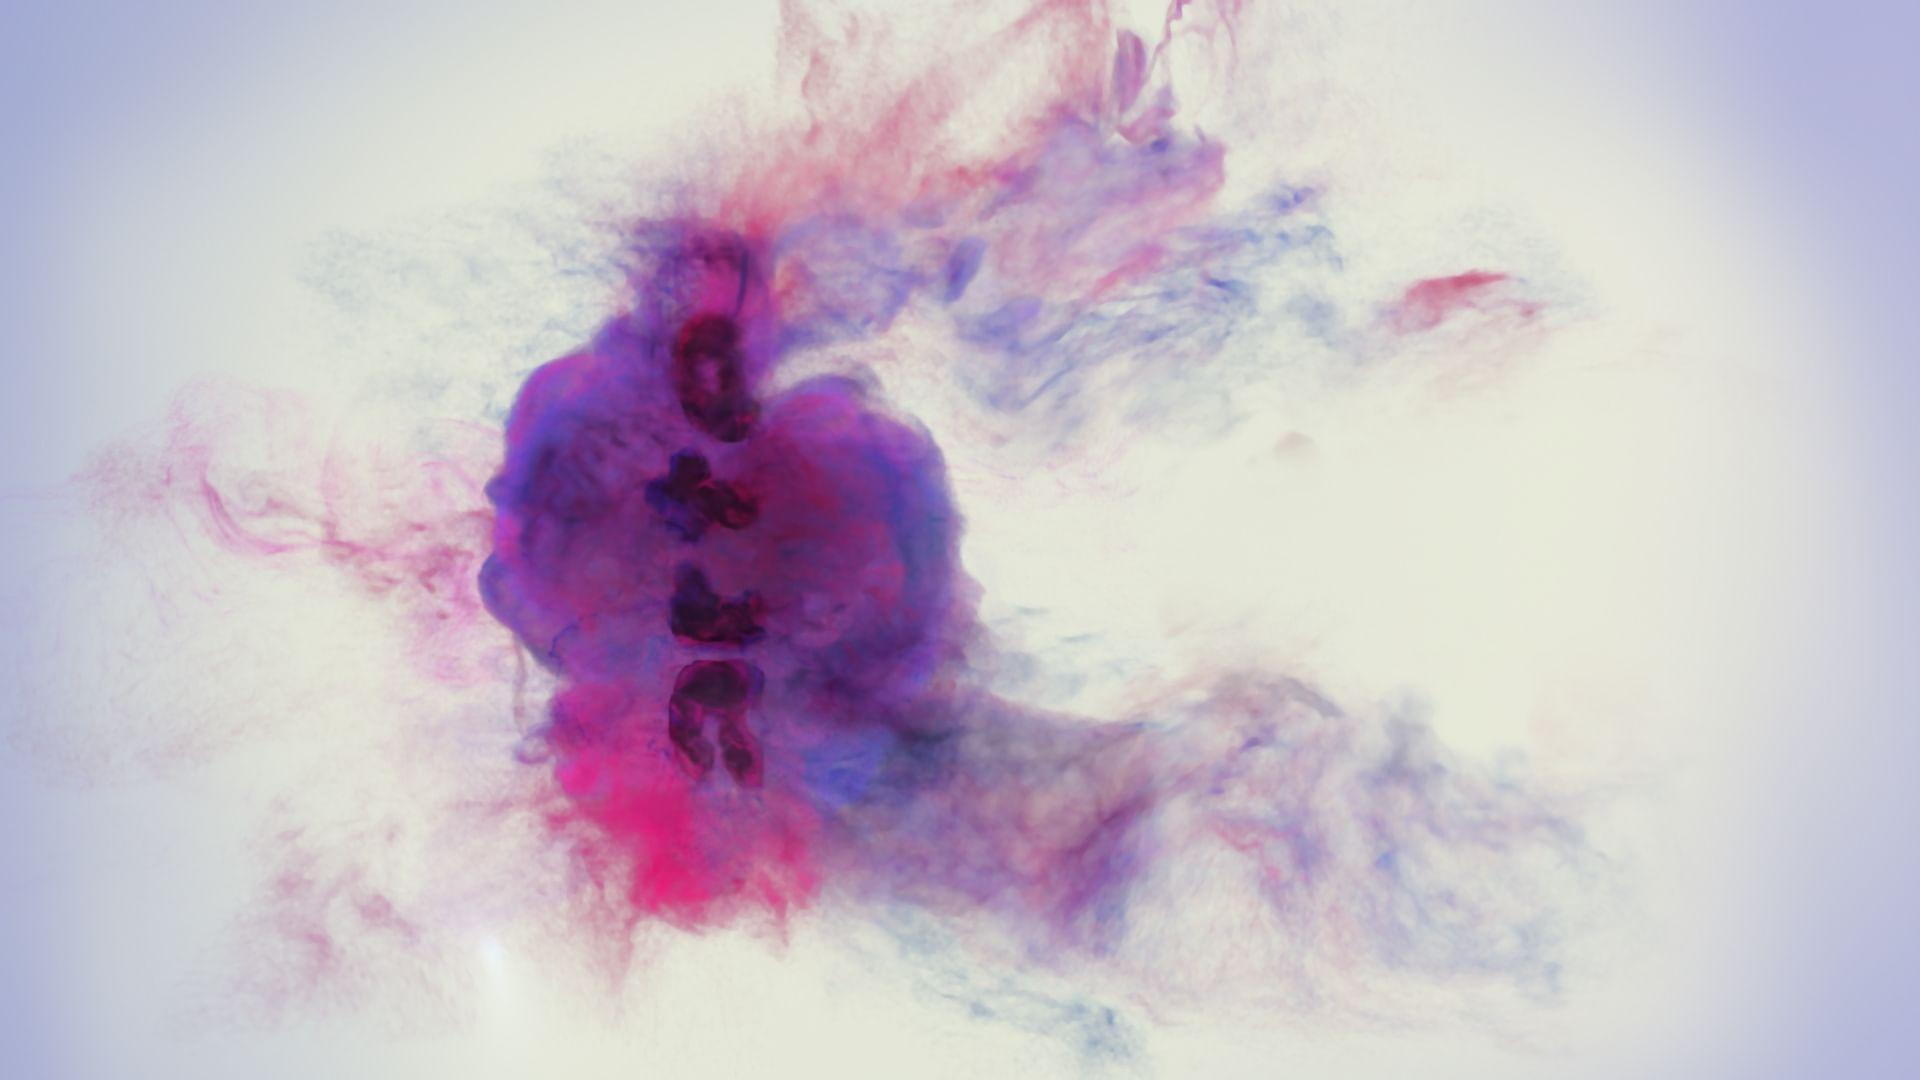 Street Photography (7/13) | Janette Beckman. Hip hop & Gang culture